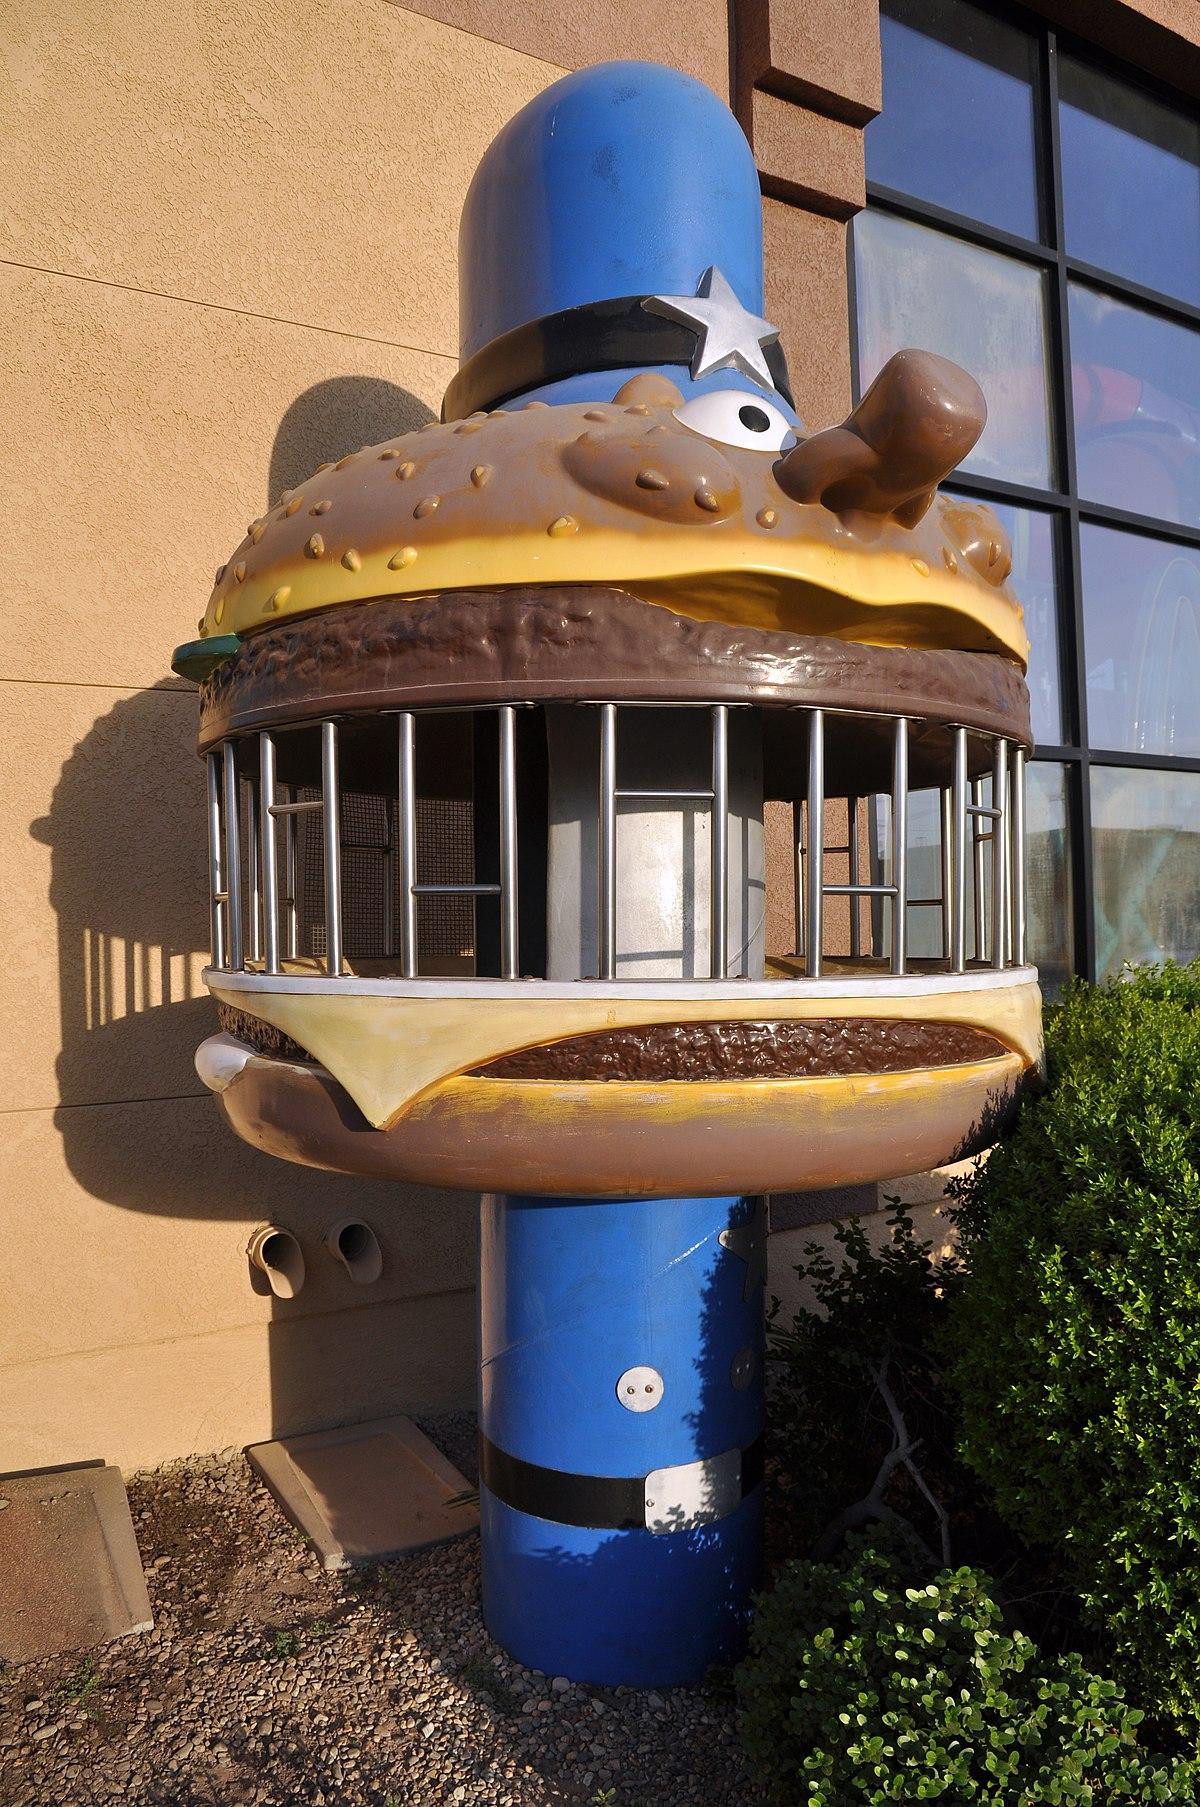 Fil:Officer big mac playground.jpg - Wikipedia, den frie encyklopædi